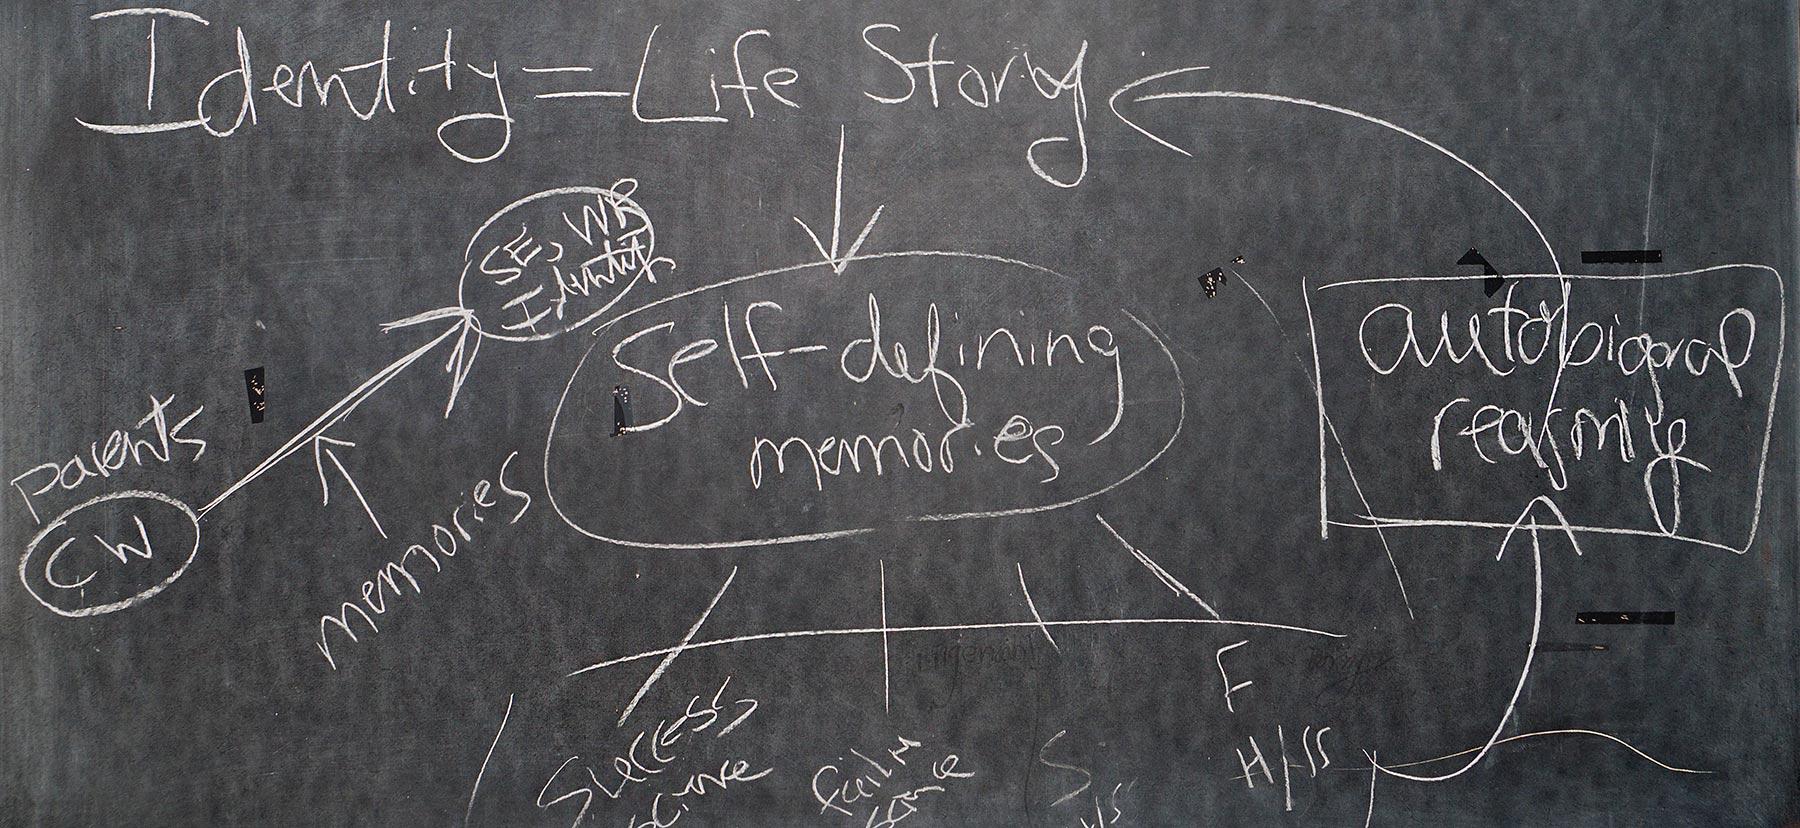 Identity = Life Story chalkboard notes